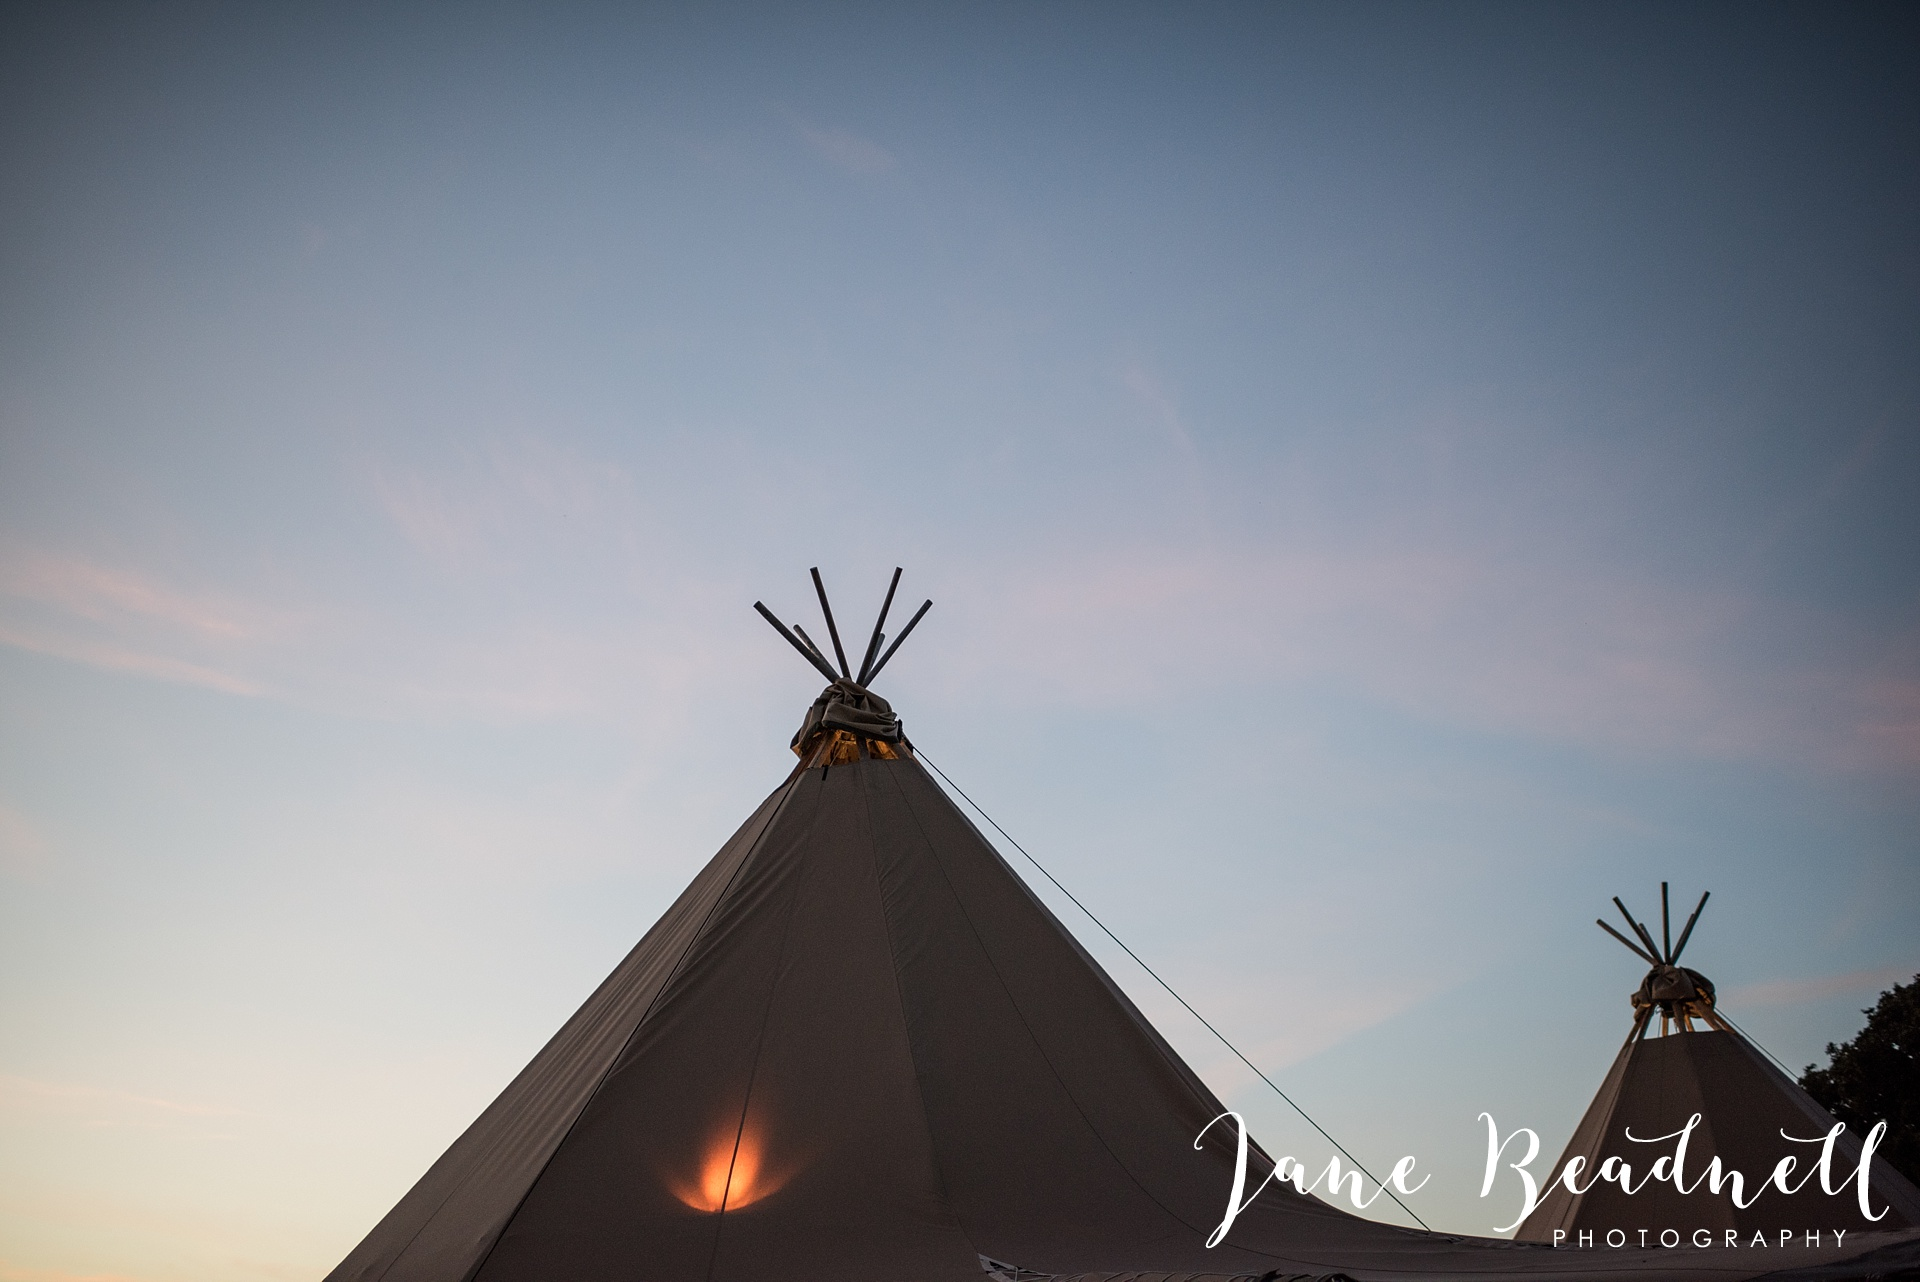 fine-art-wedding-photographer-jane-beadnell-yorkshire-wedding-photographer_0162